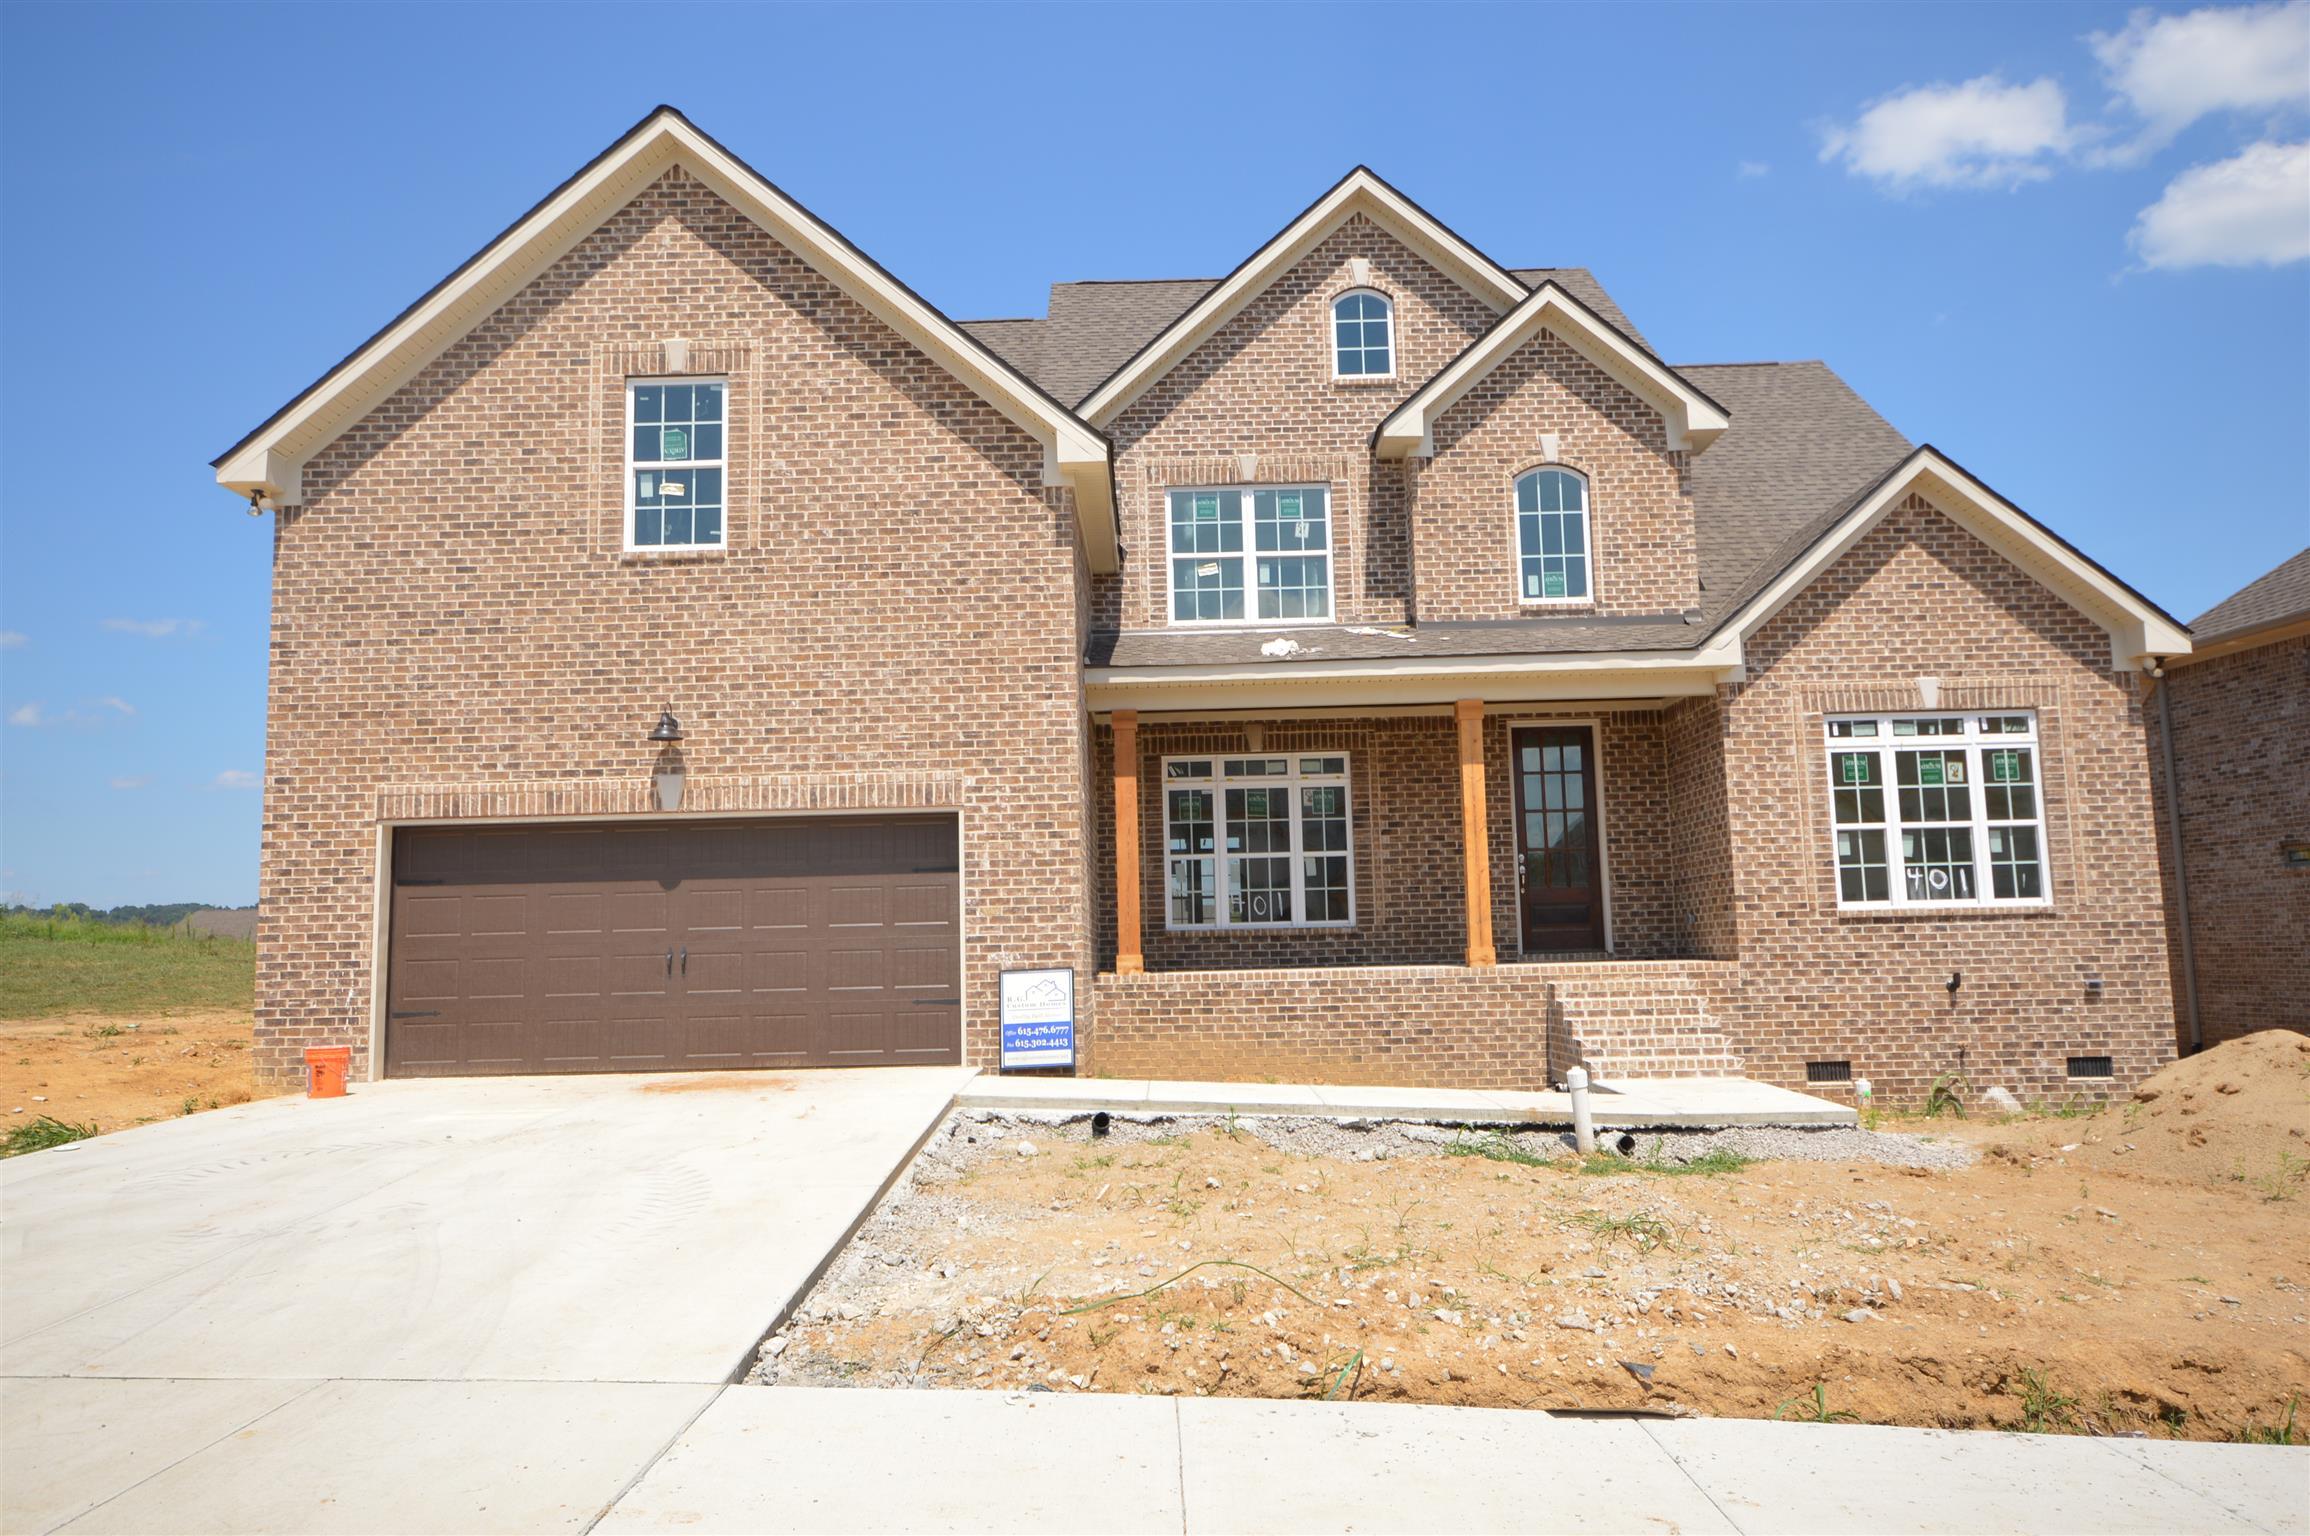 1015 Alpaca Drive (401), Spring Hill, TN 37174 - Spring Hill, TN real estate listing